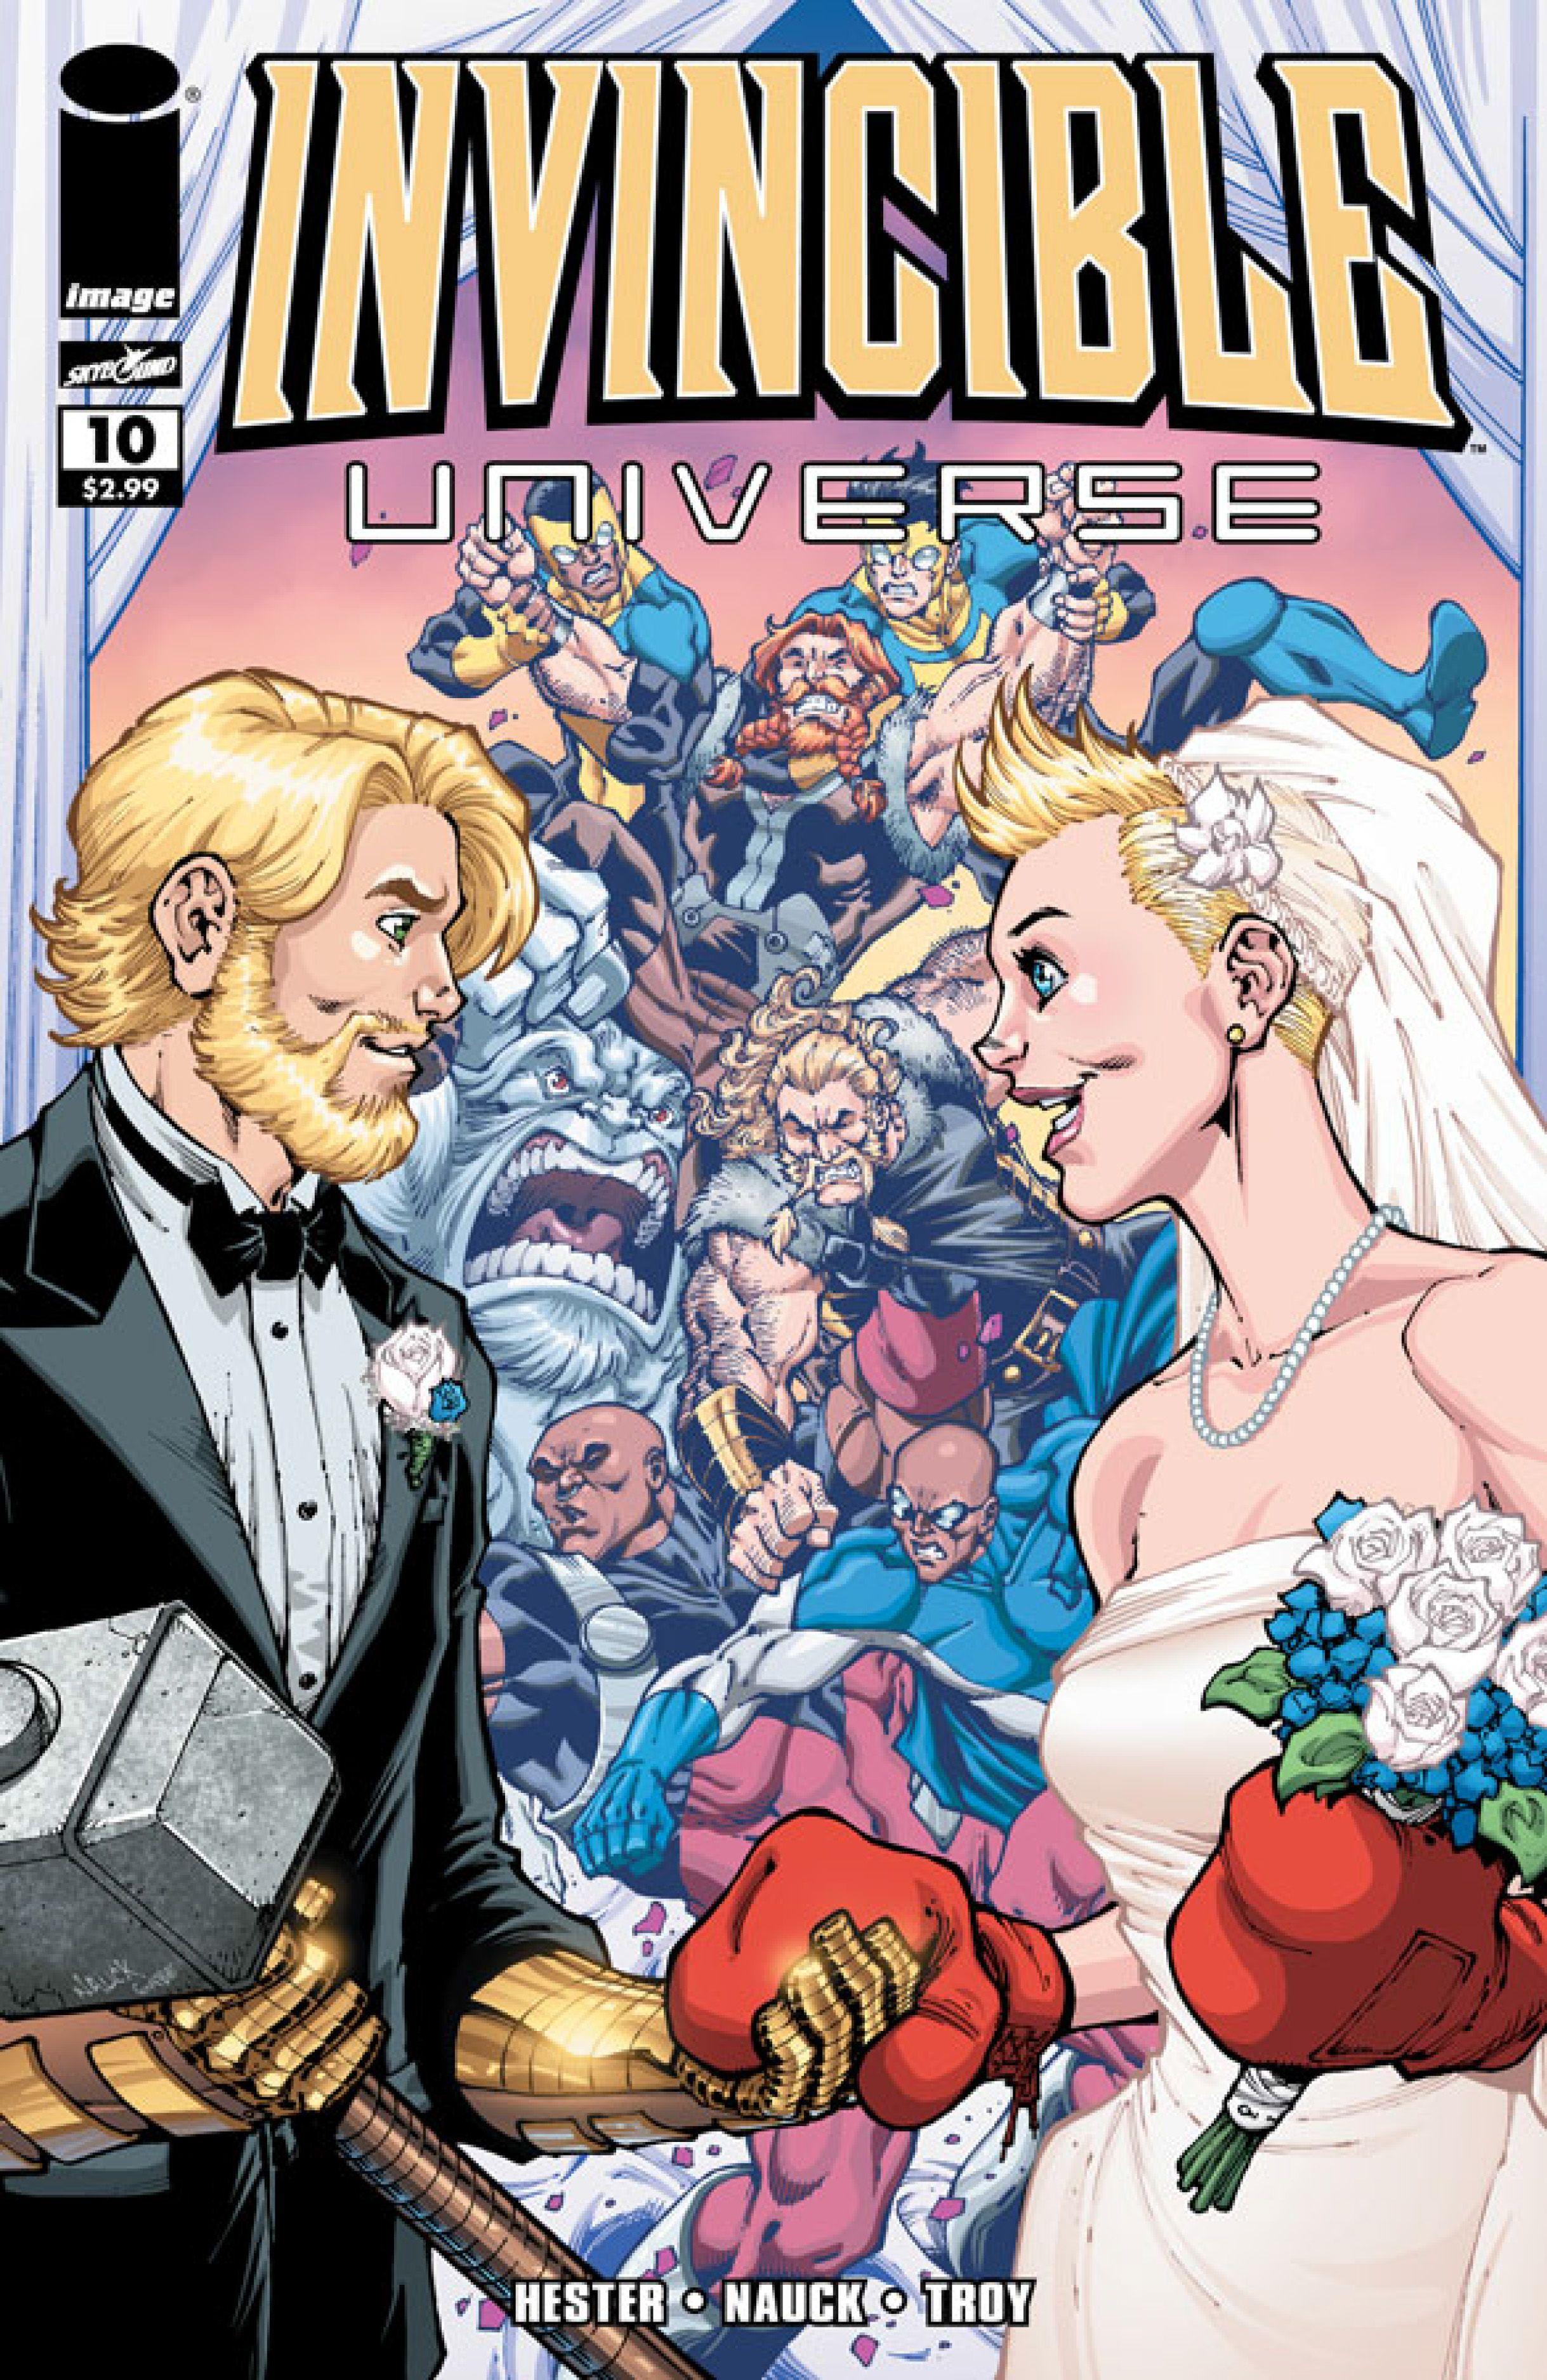 thor comic cover wedding  invincibleuniverse10coverjpg  superhero table ideas  Pinterest